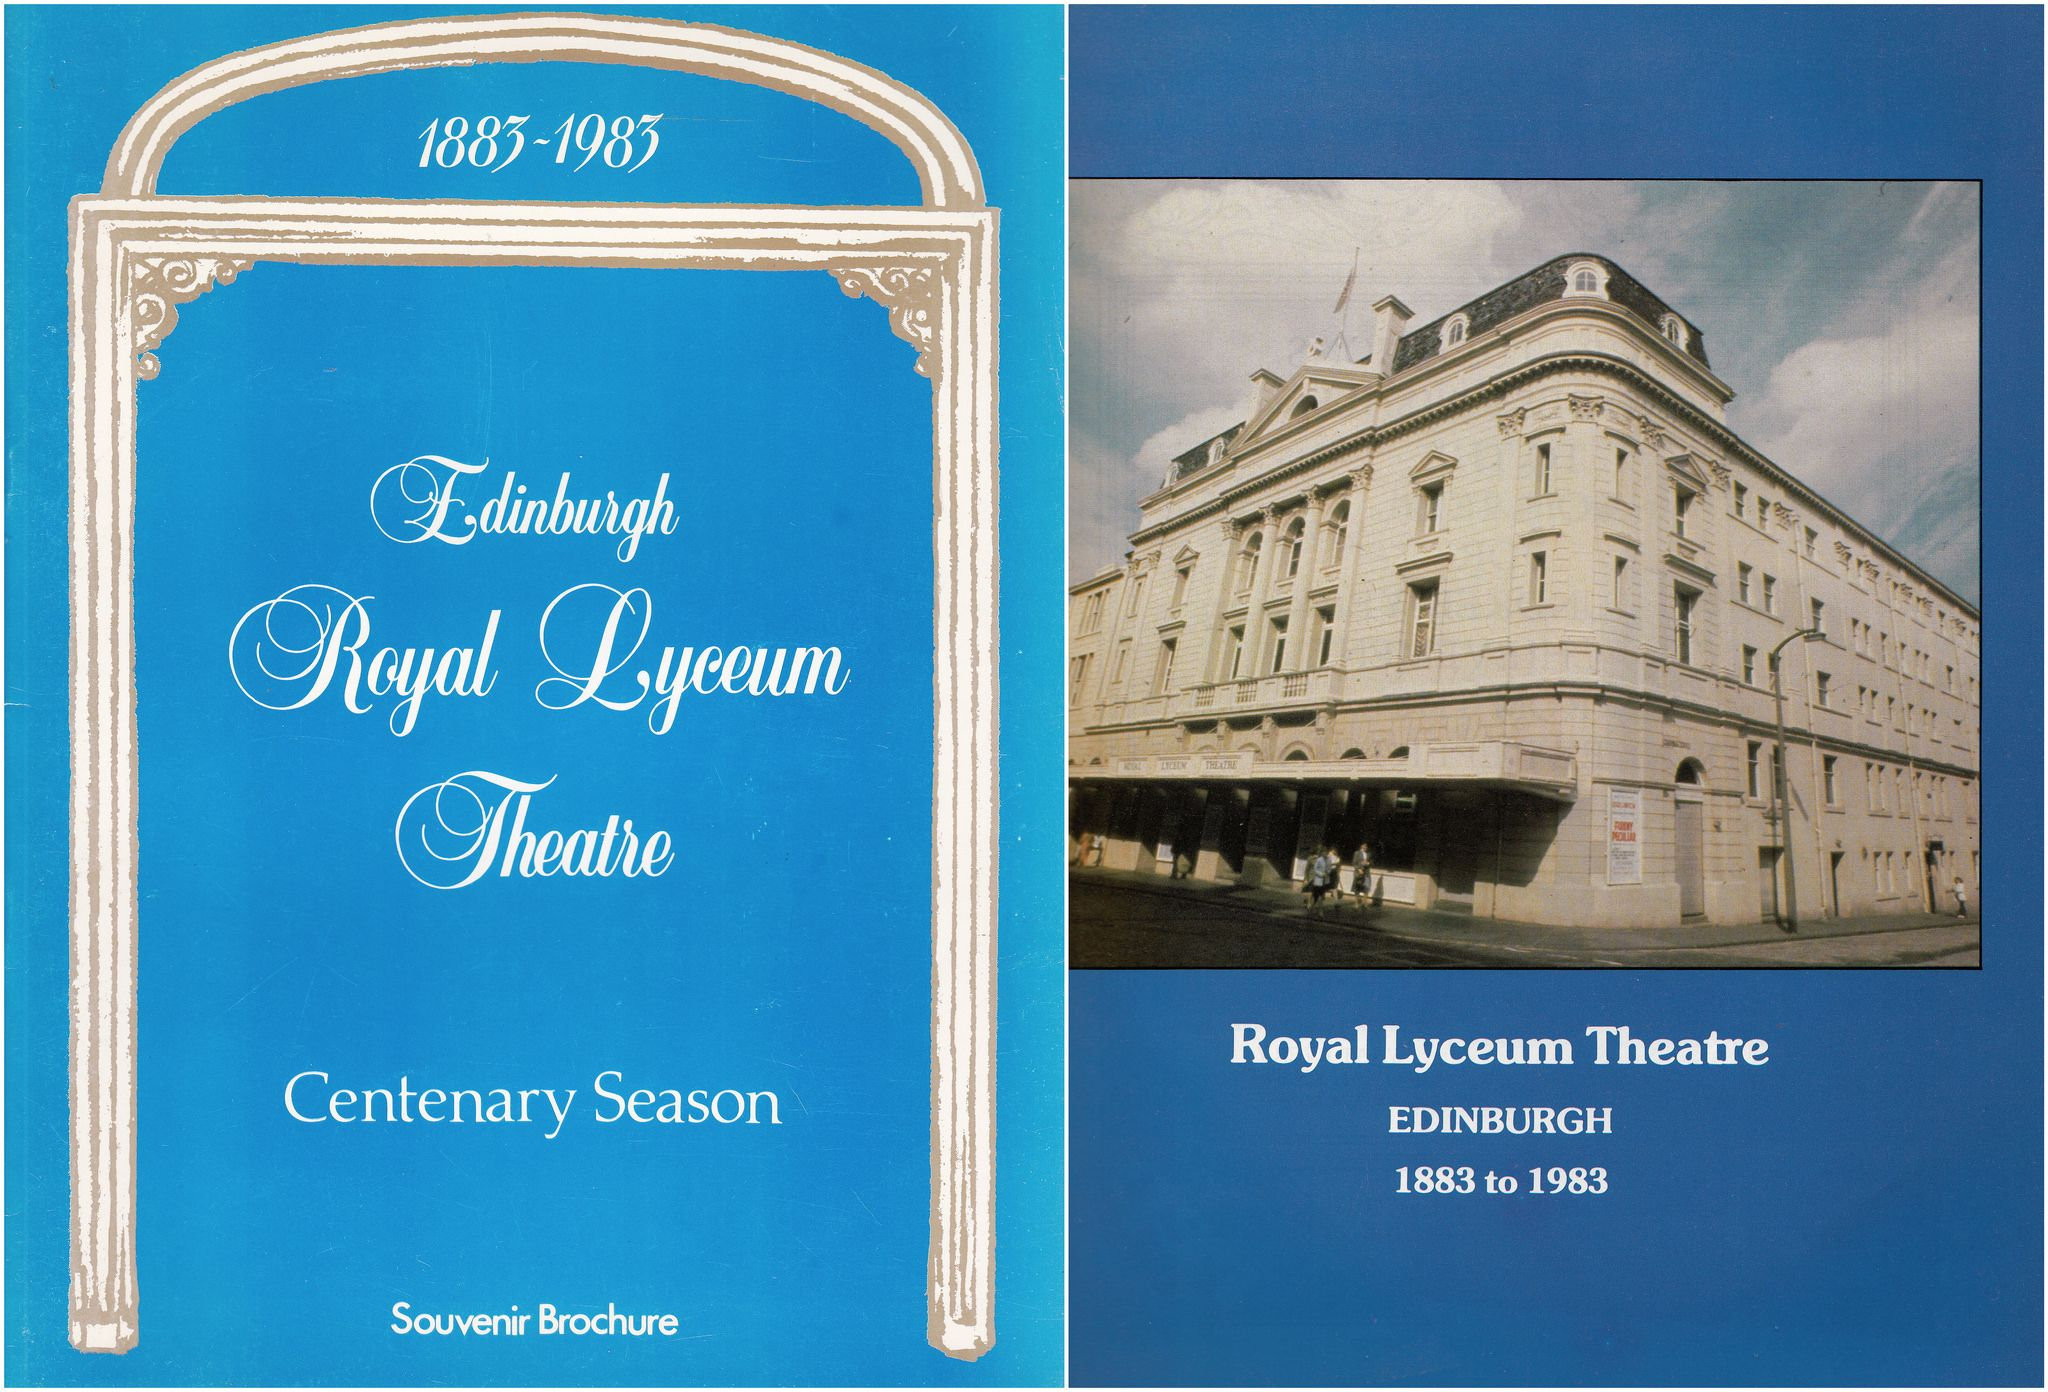 Souvenir Brochure for Centenary Season of Royal Lyceum Theatre 1883 1983